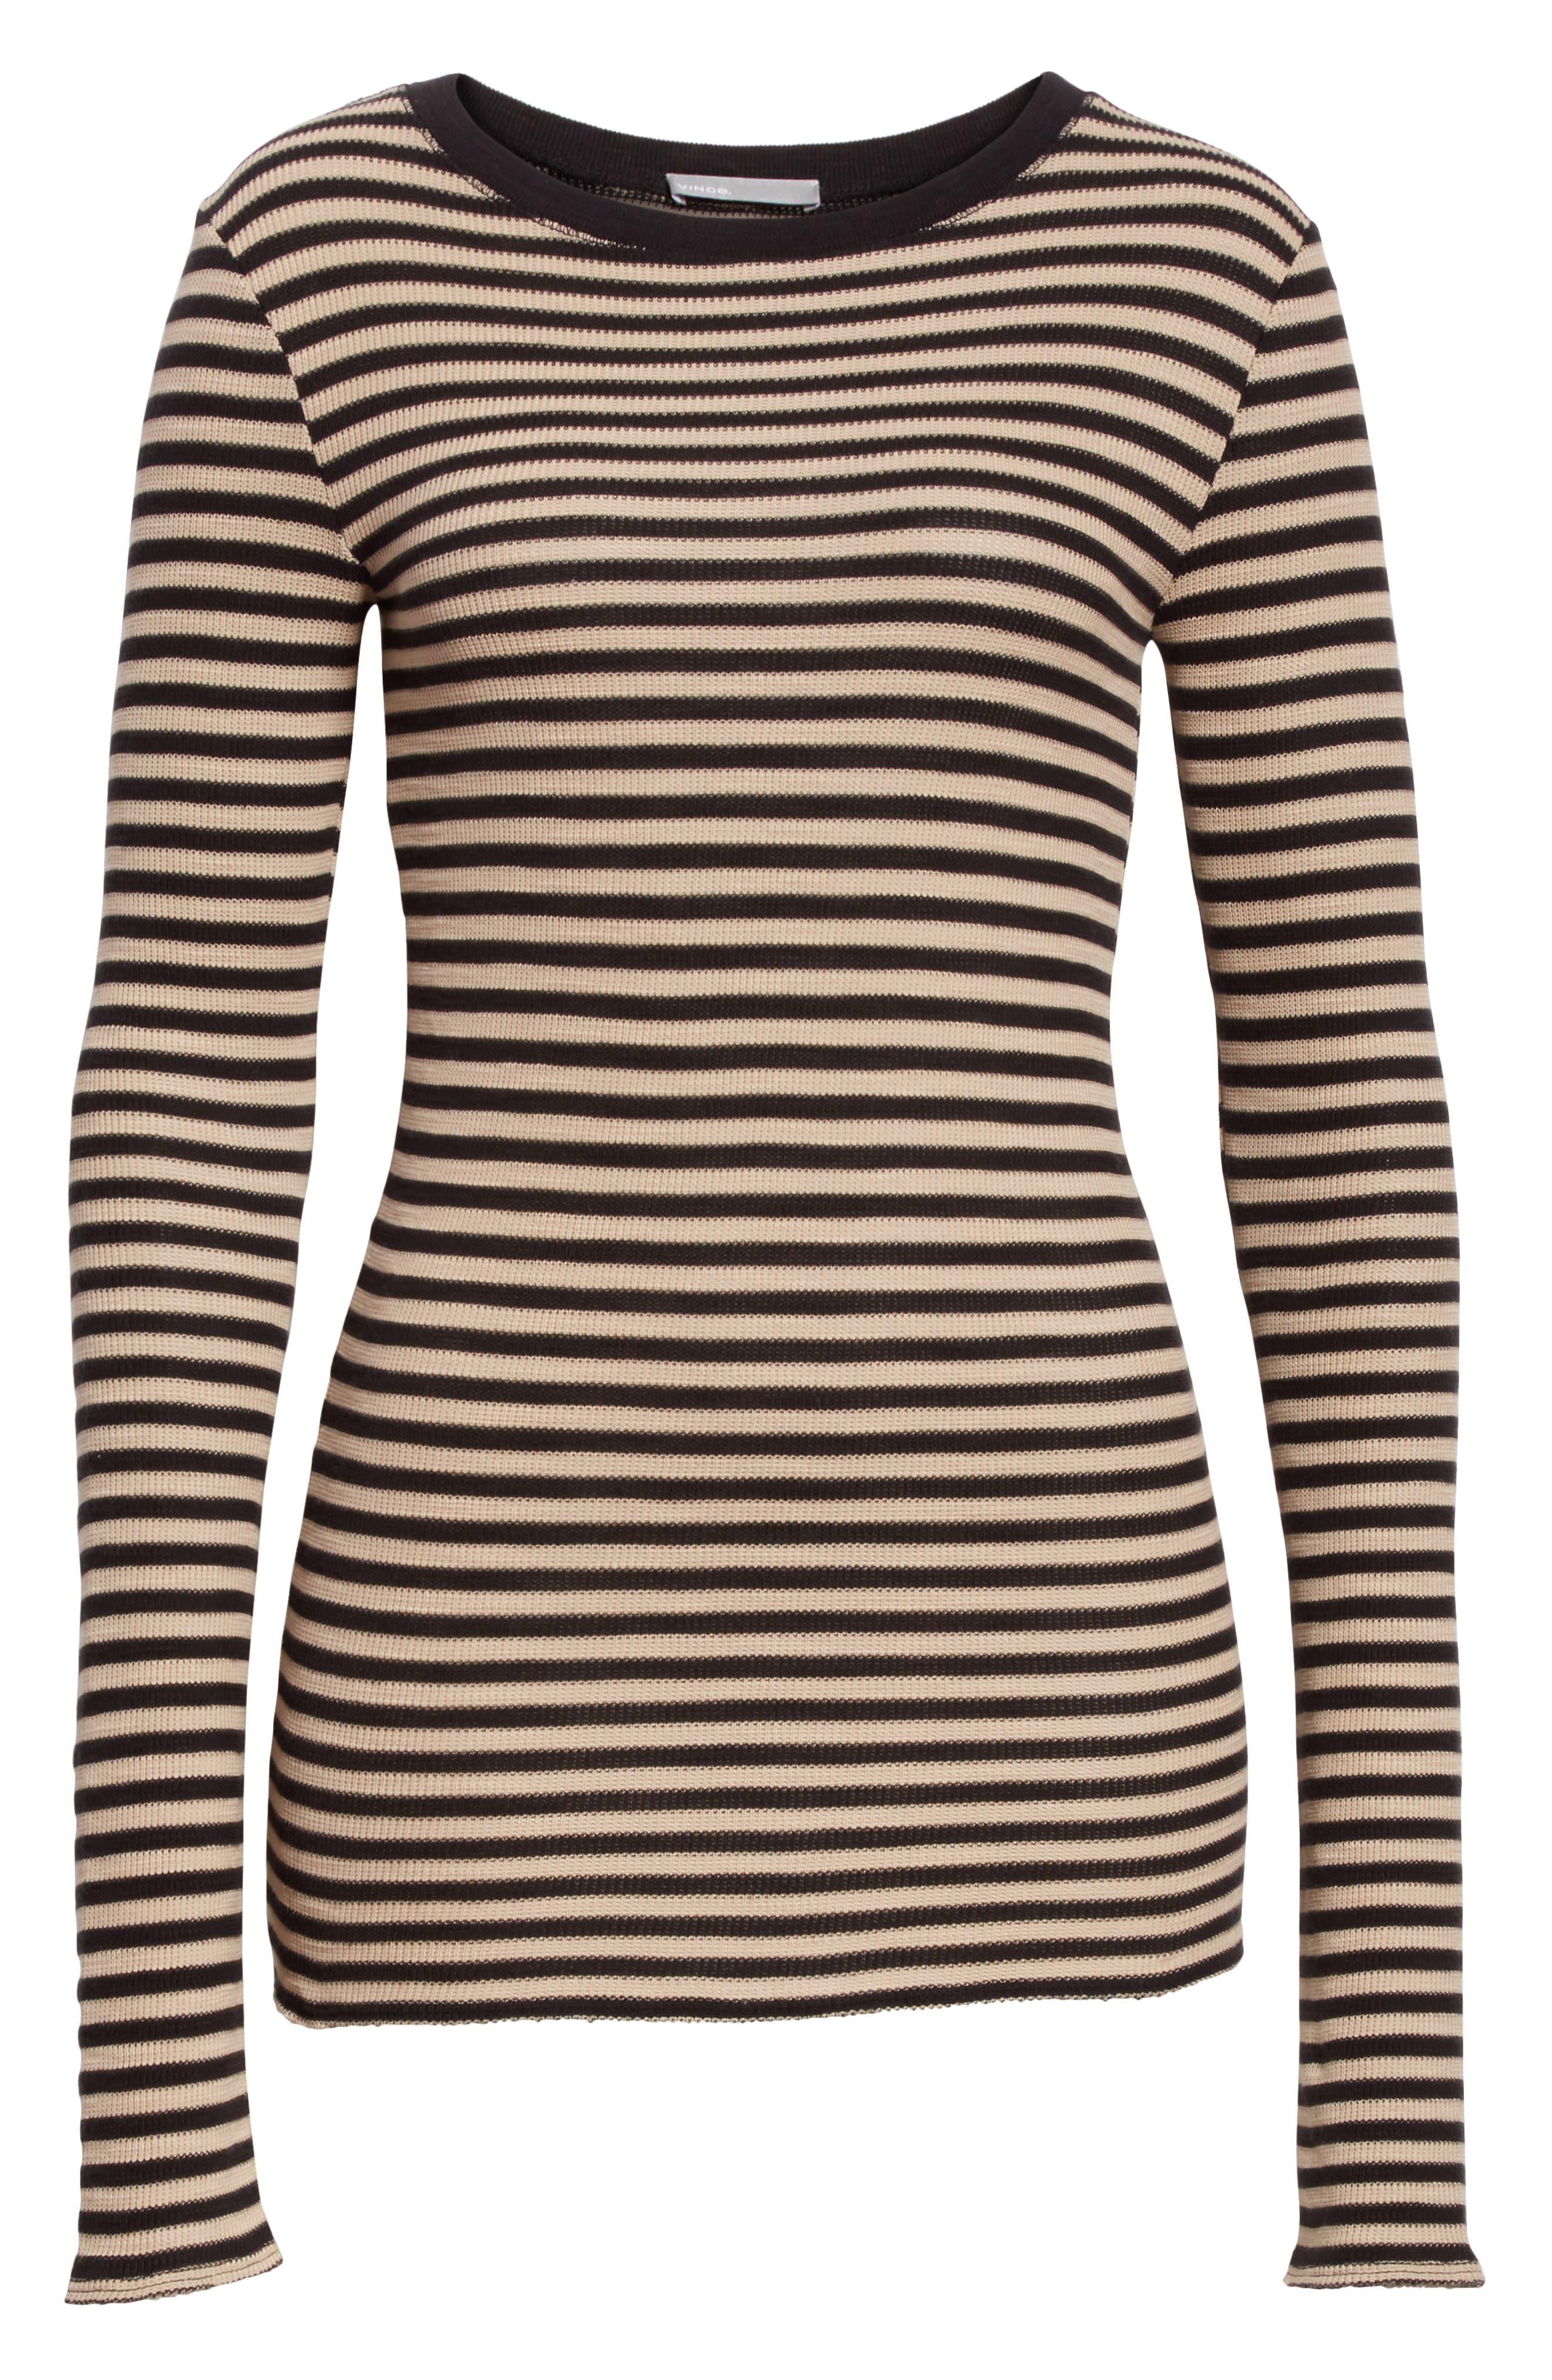 Railroad Stripe Crewneck Sweater,                             Alternate thumbnail 8, color,                             Taupe/ Black